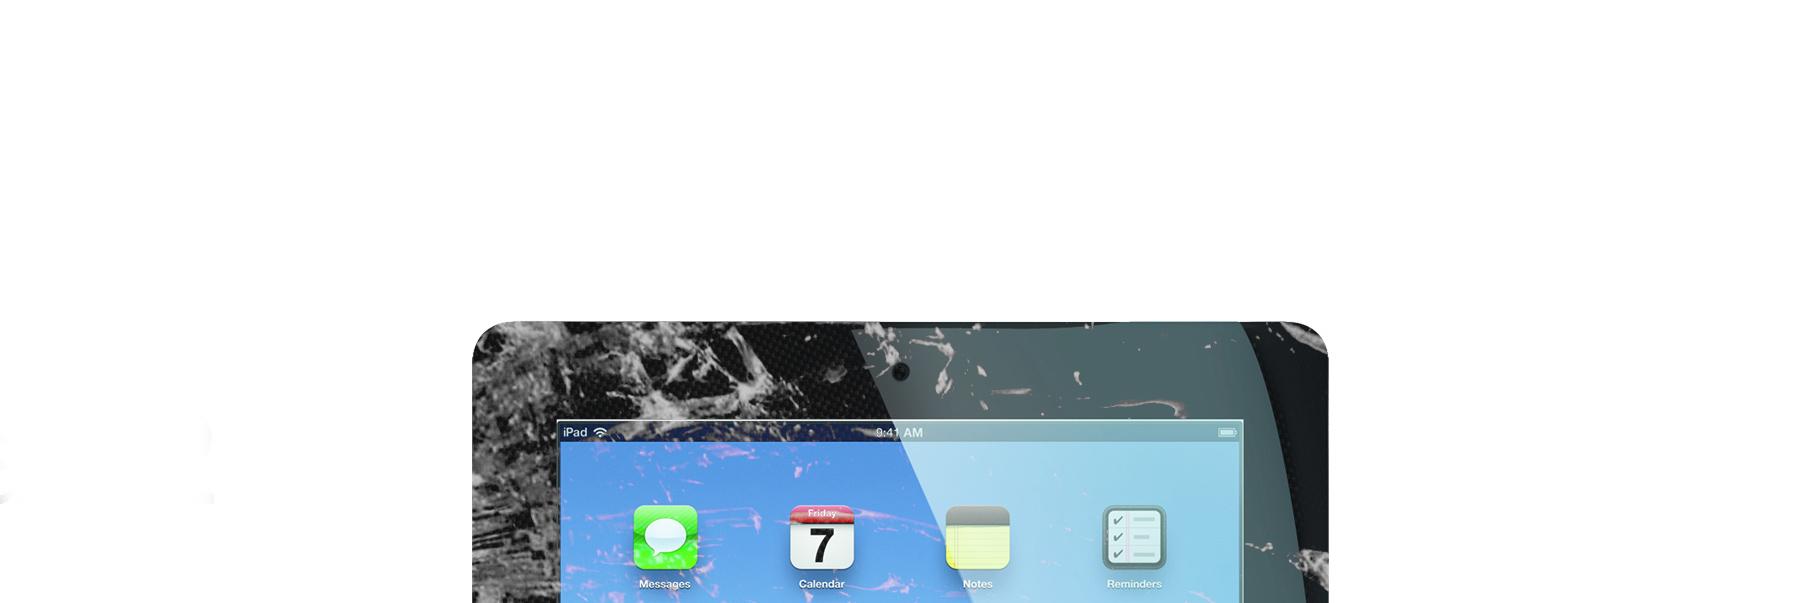 iPad Air Screen Repair - The Device Shop Mail-In Service